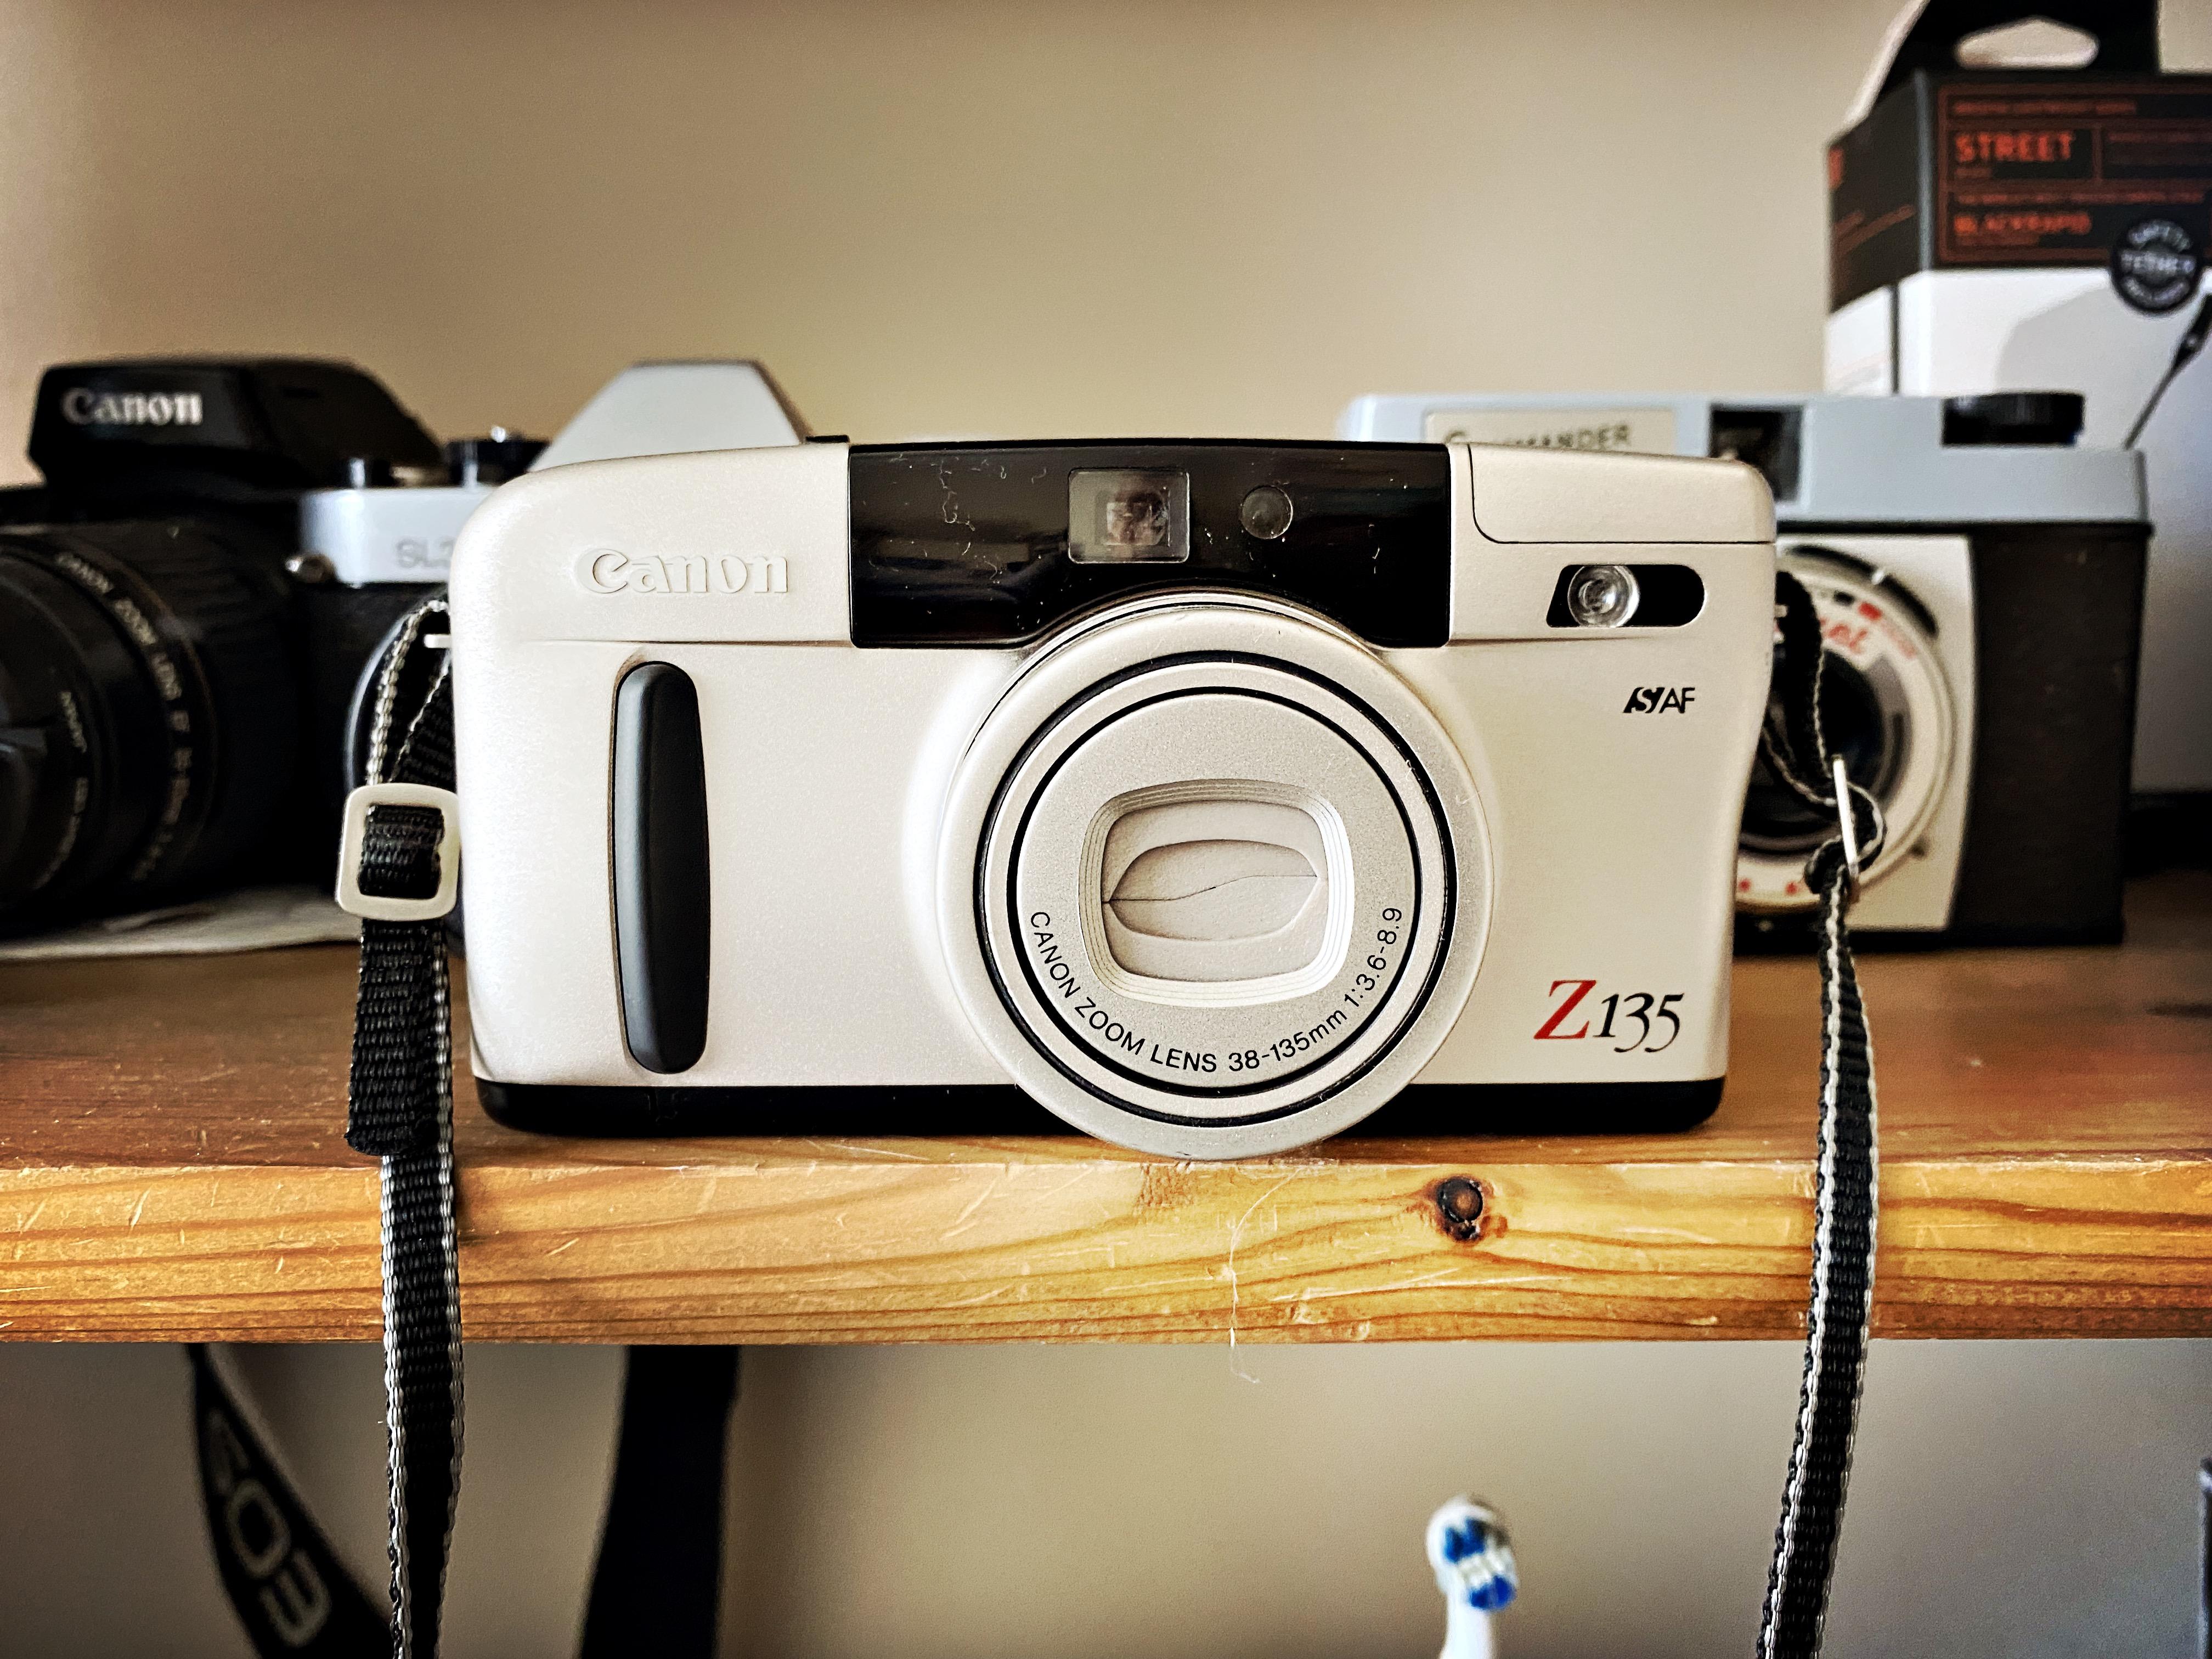 Canon Sureshot Z135 ~ 2021